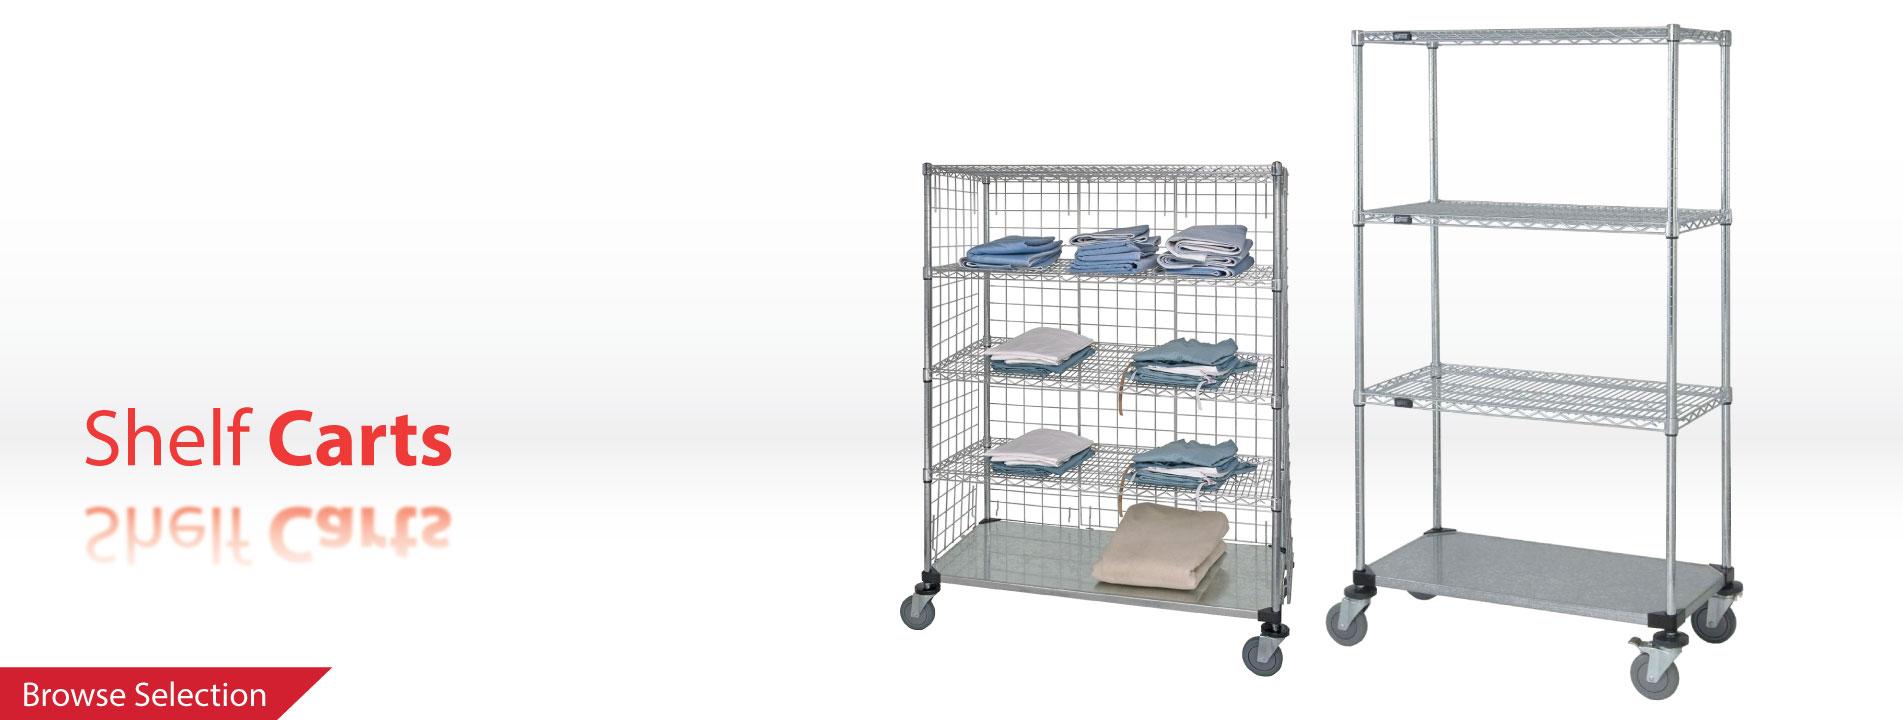 Shelf-Carts